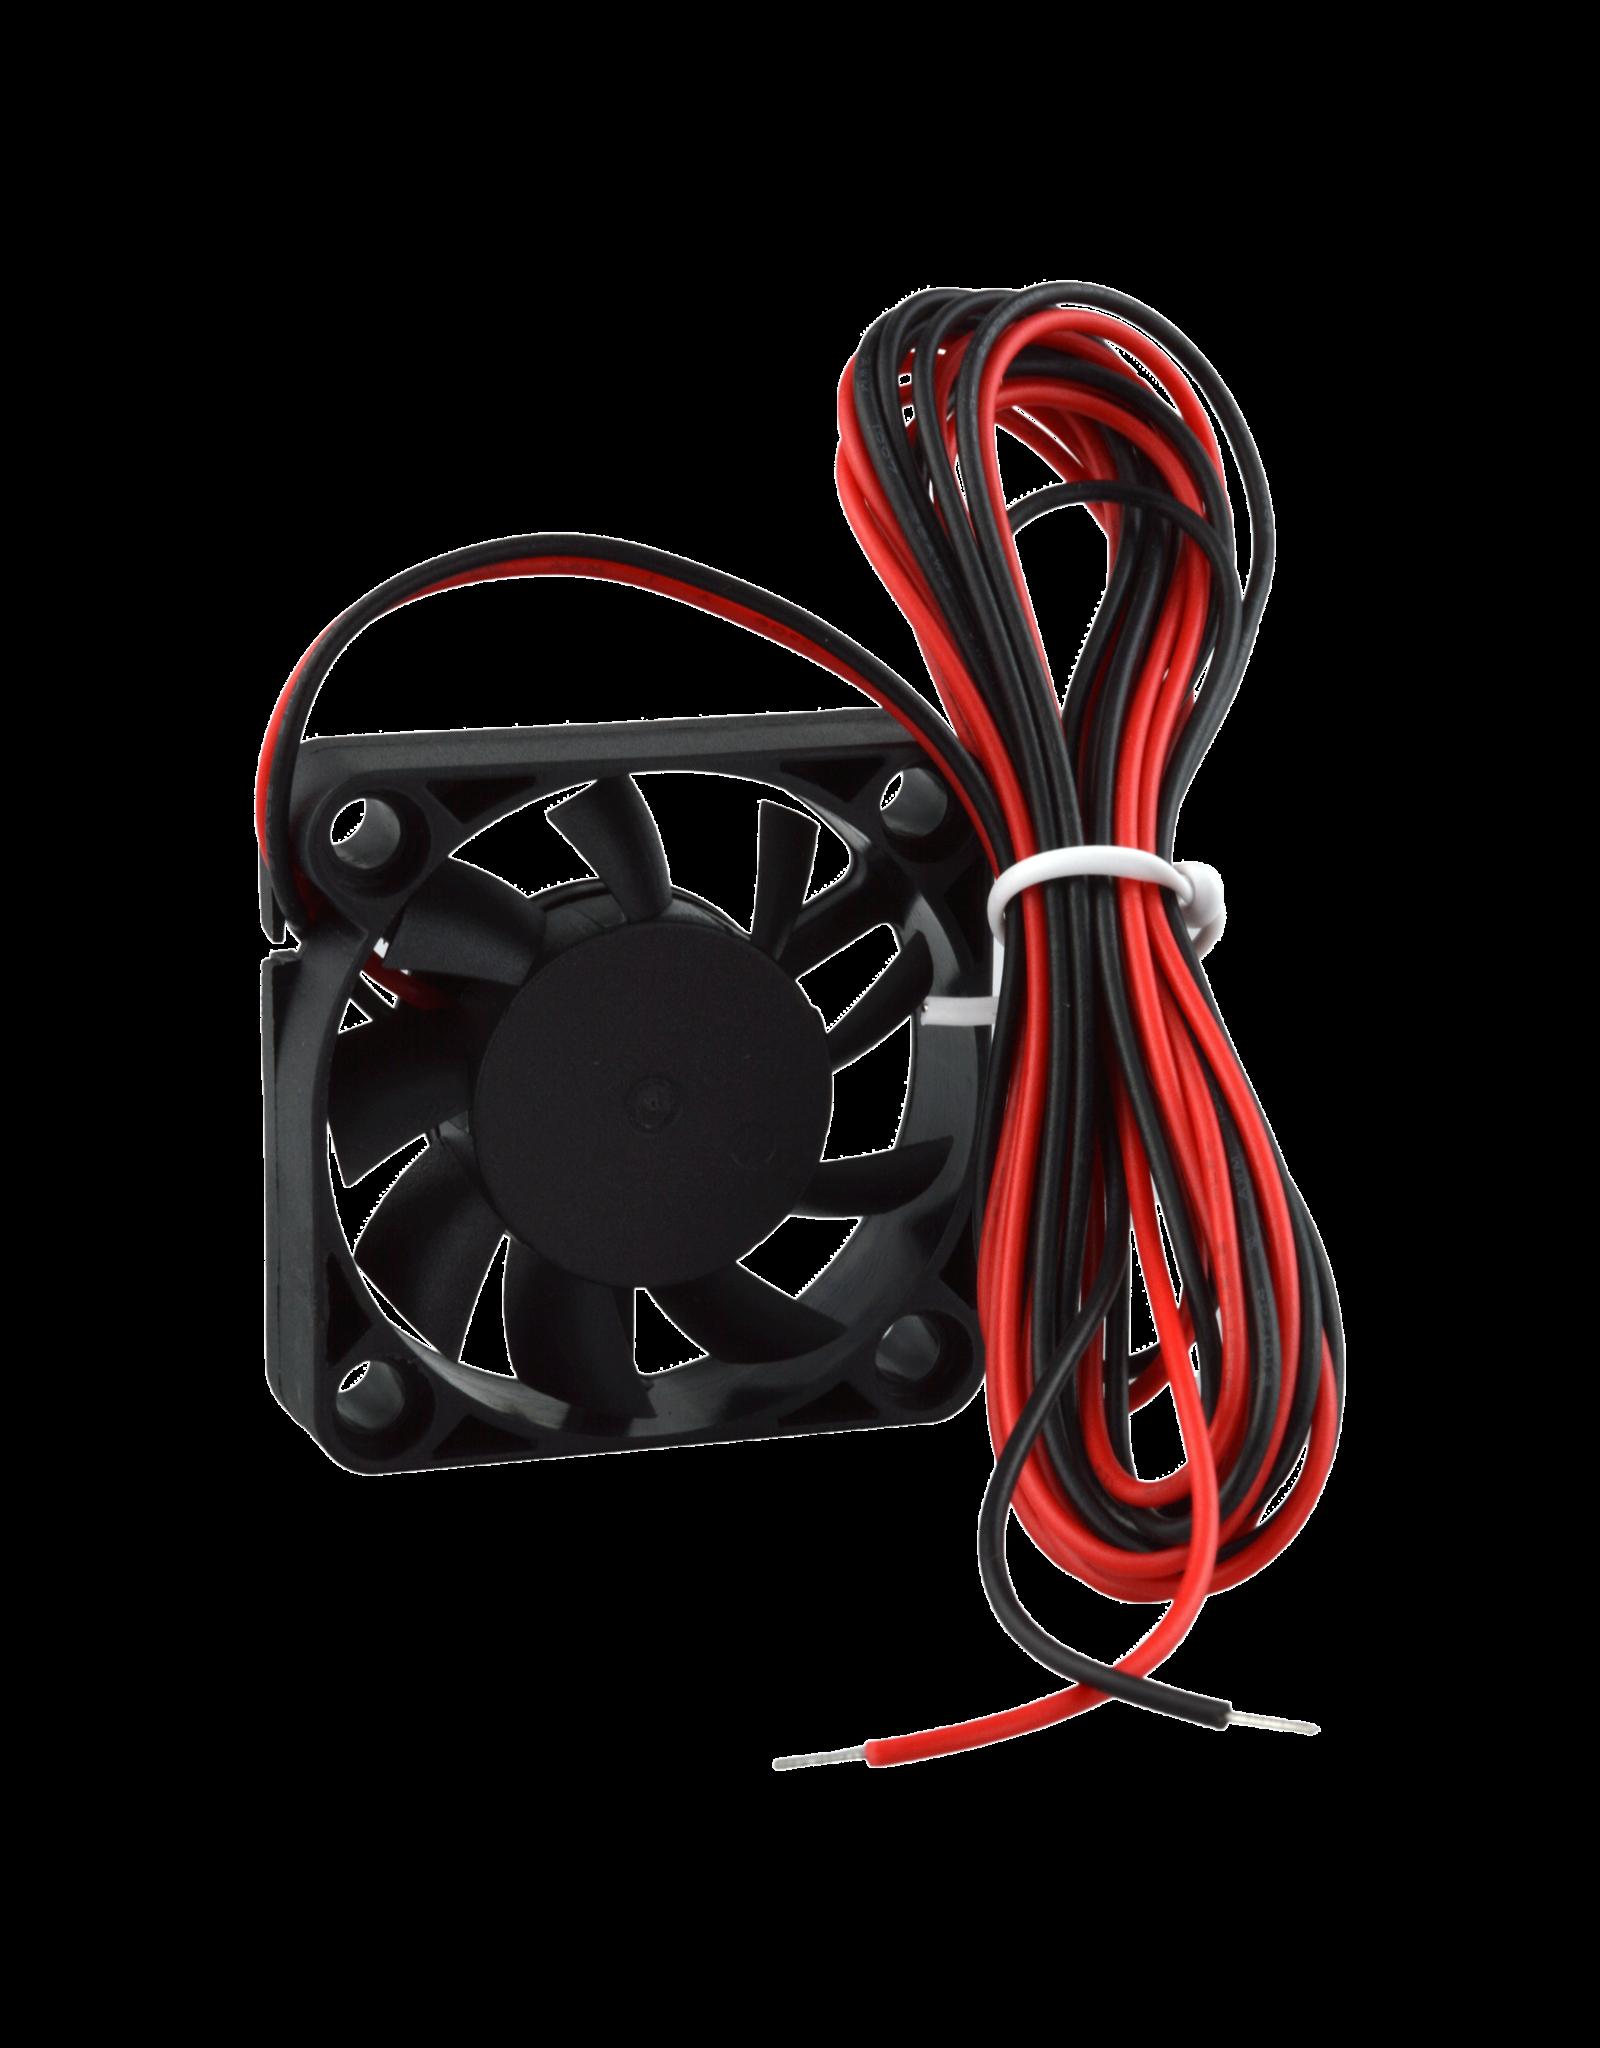 Creality/Ender  Creality 3D Ender 3 V2 Axial Fan